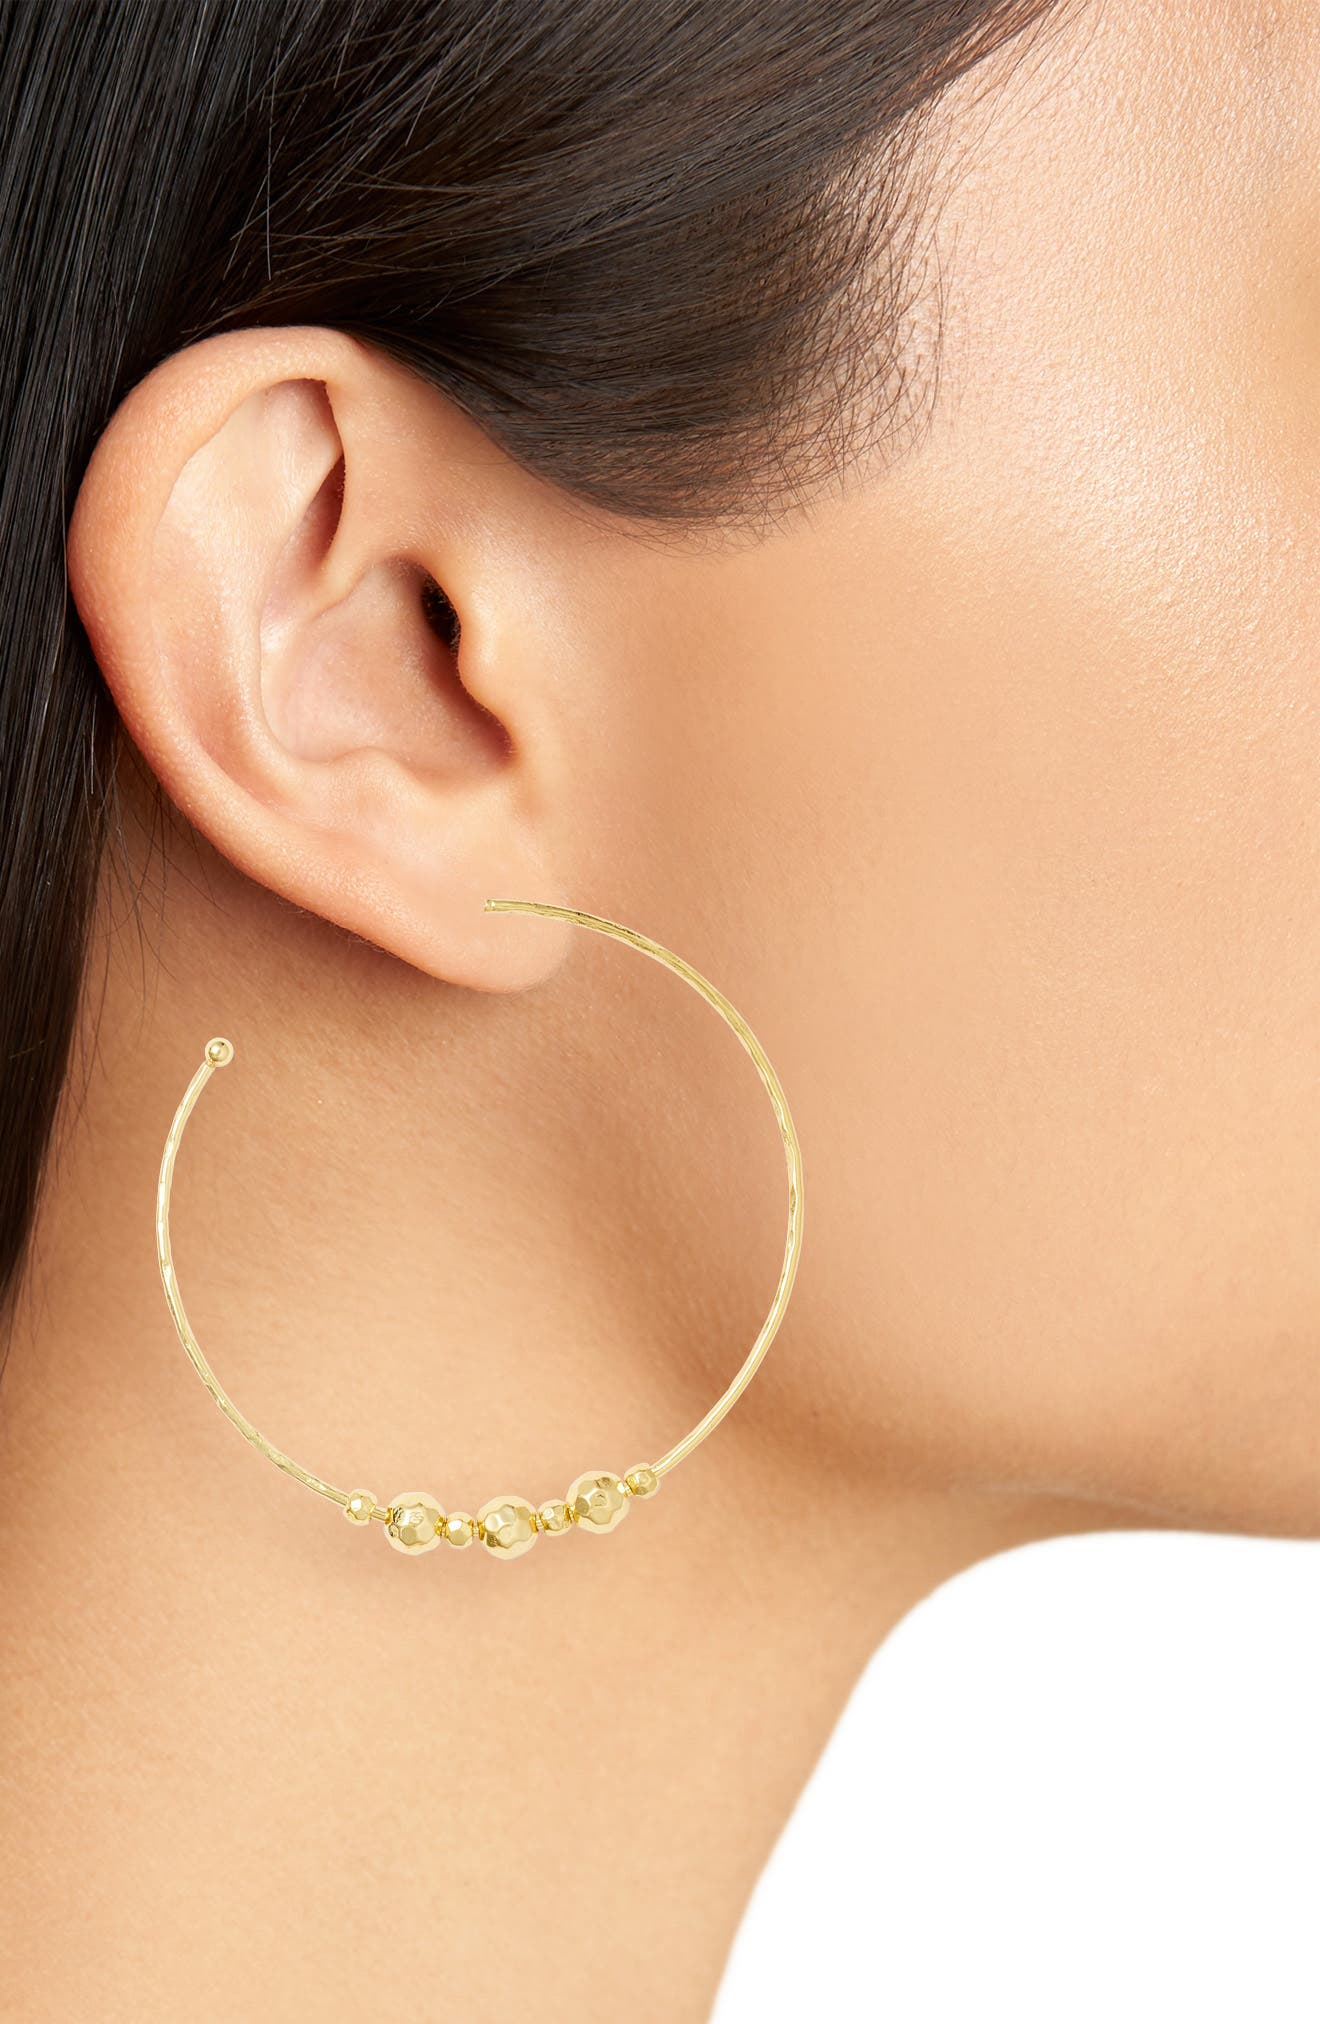 Taner Bead Hoop Earrings,                             Alternate thumbnail 2, color,                             Gold